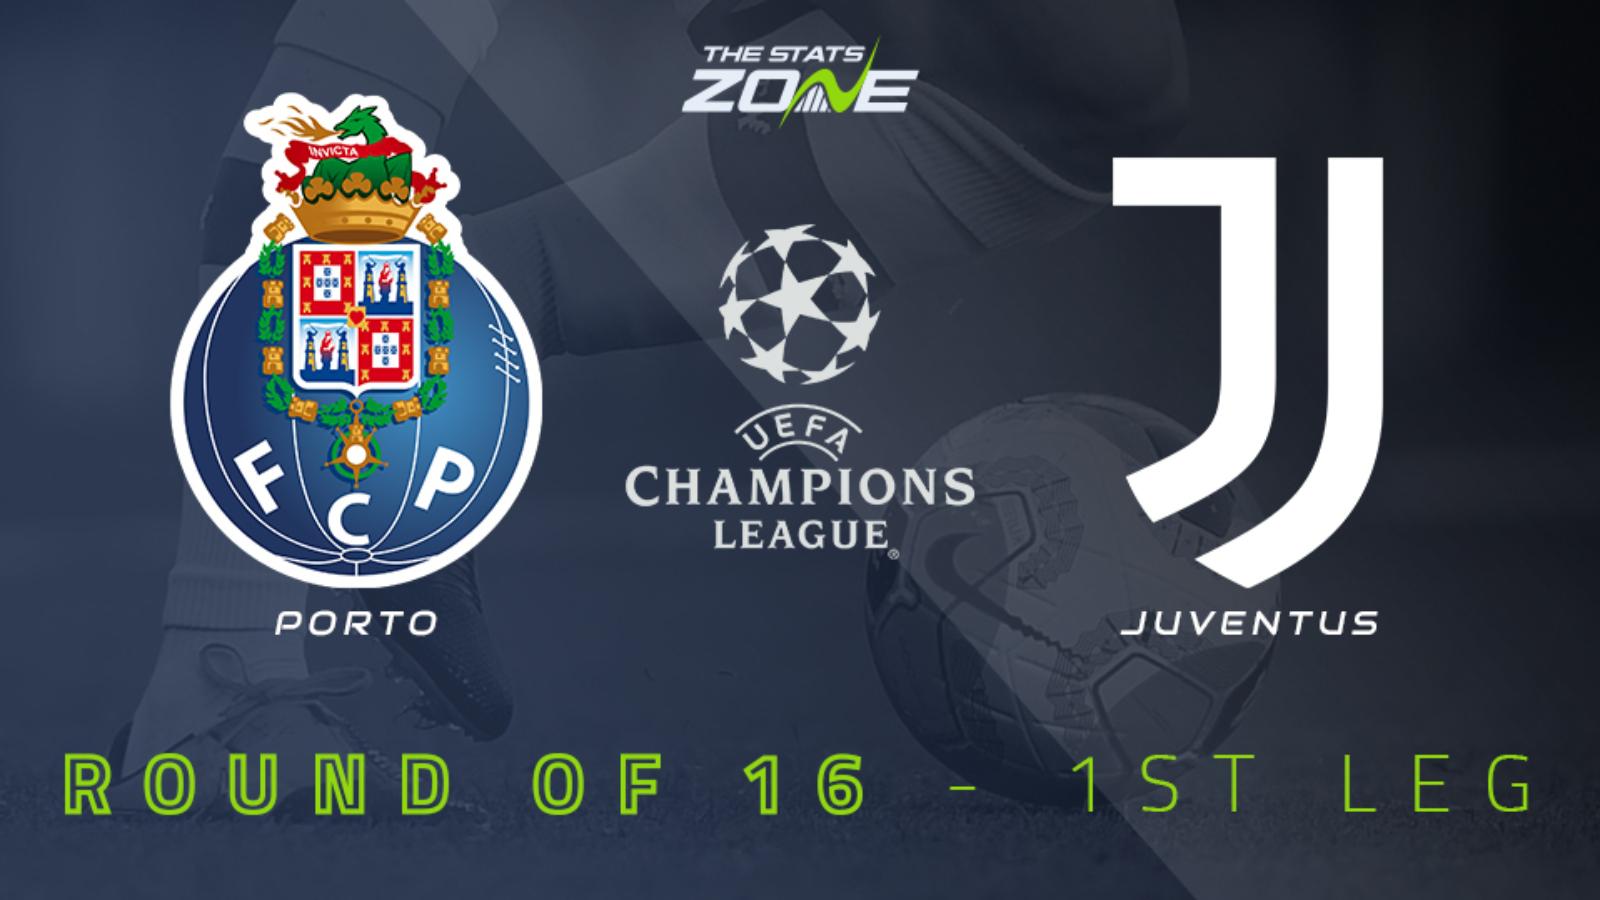 UCL_2021_Ro16_1stLeg_Porto_Vs_Juventus